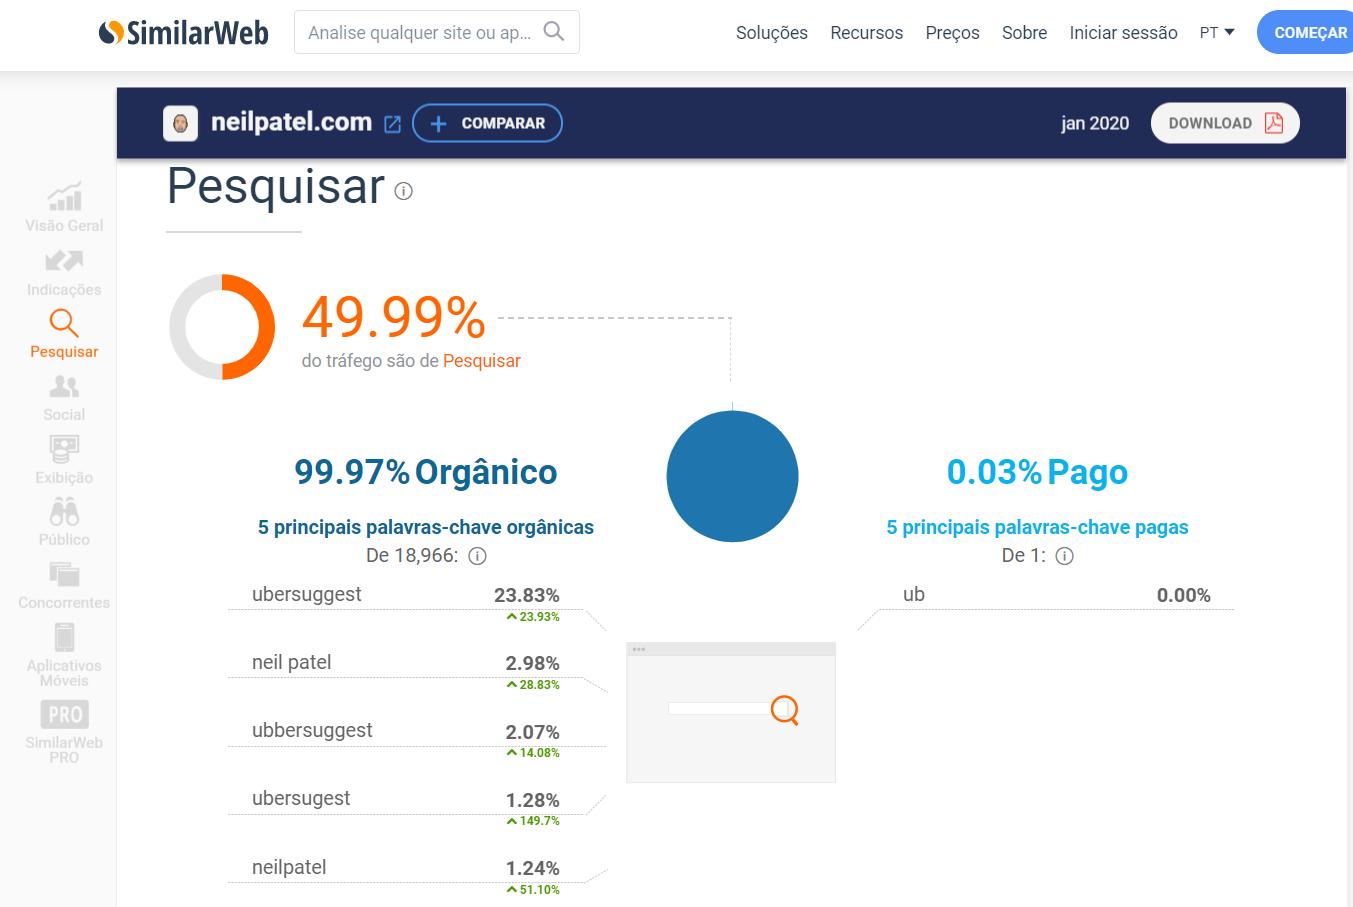 ferramenta pesquisar dentro da plataforma SimilarWeb